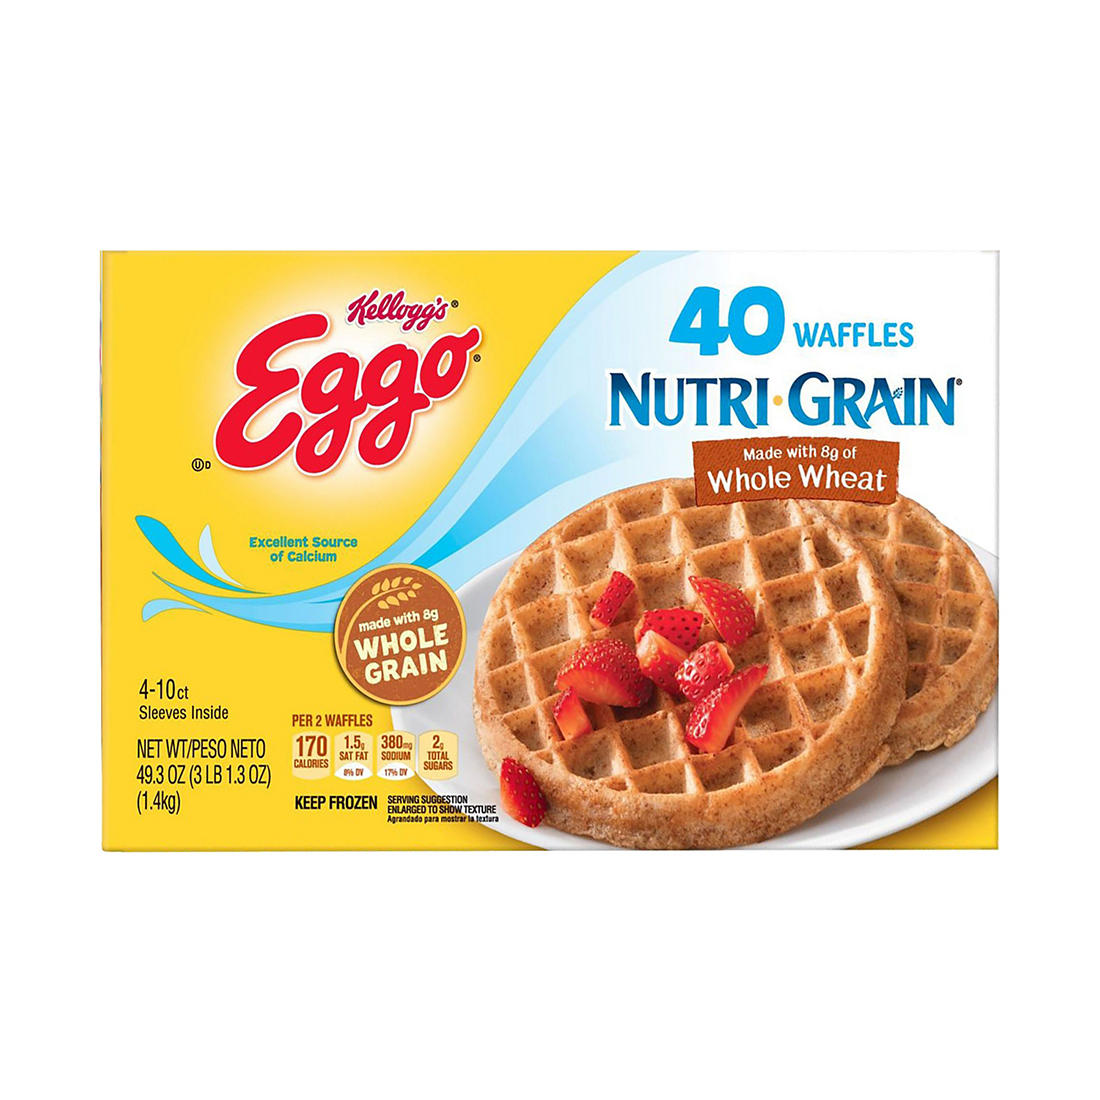 Kellogg's Eggo Nutri-Grain Waffles, 40